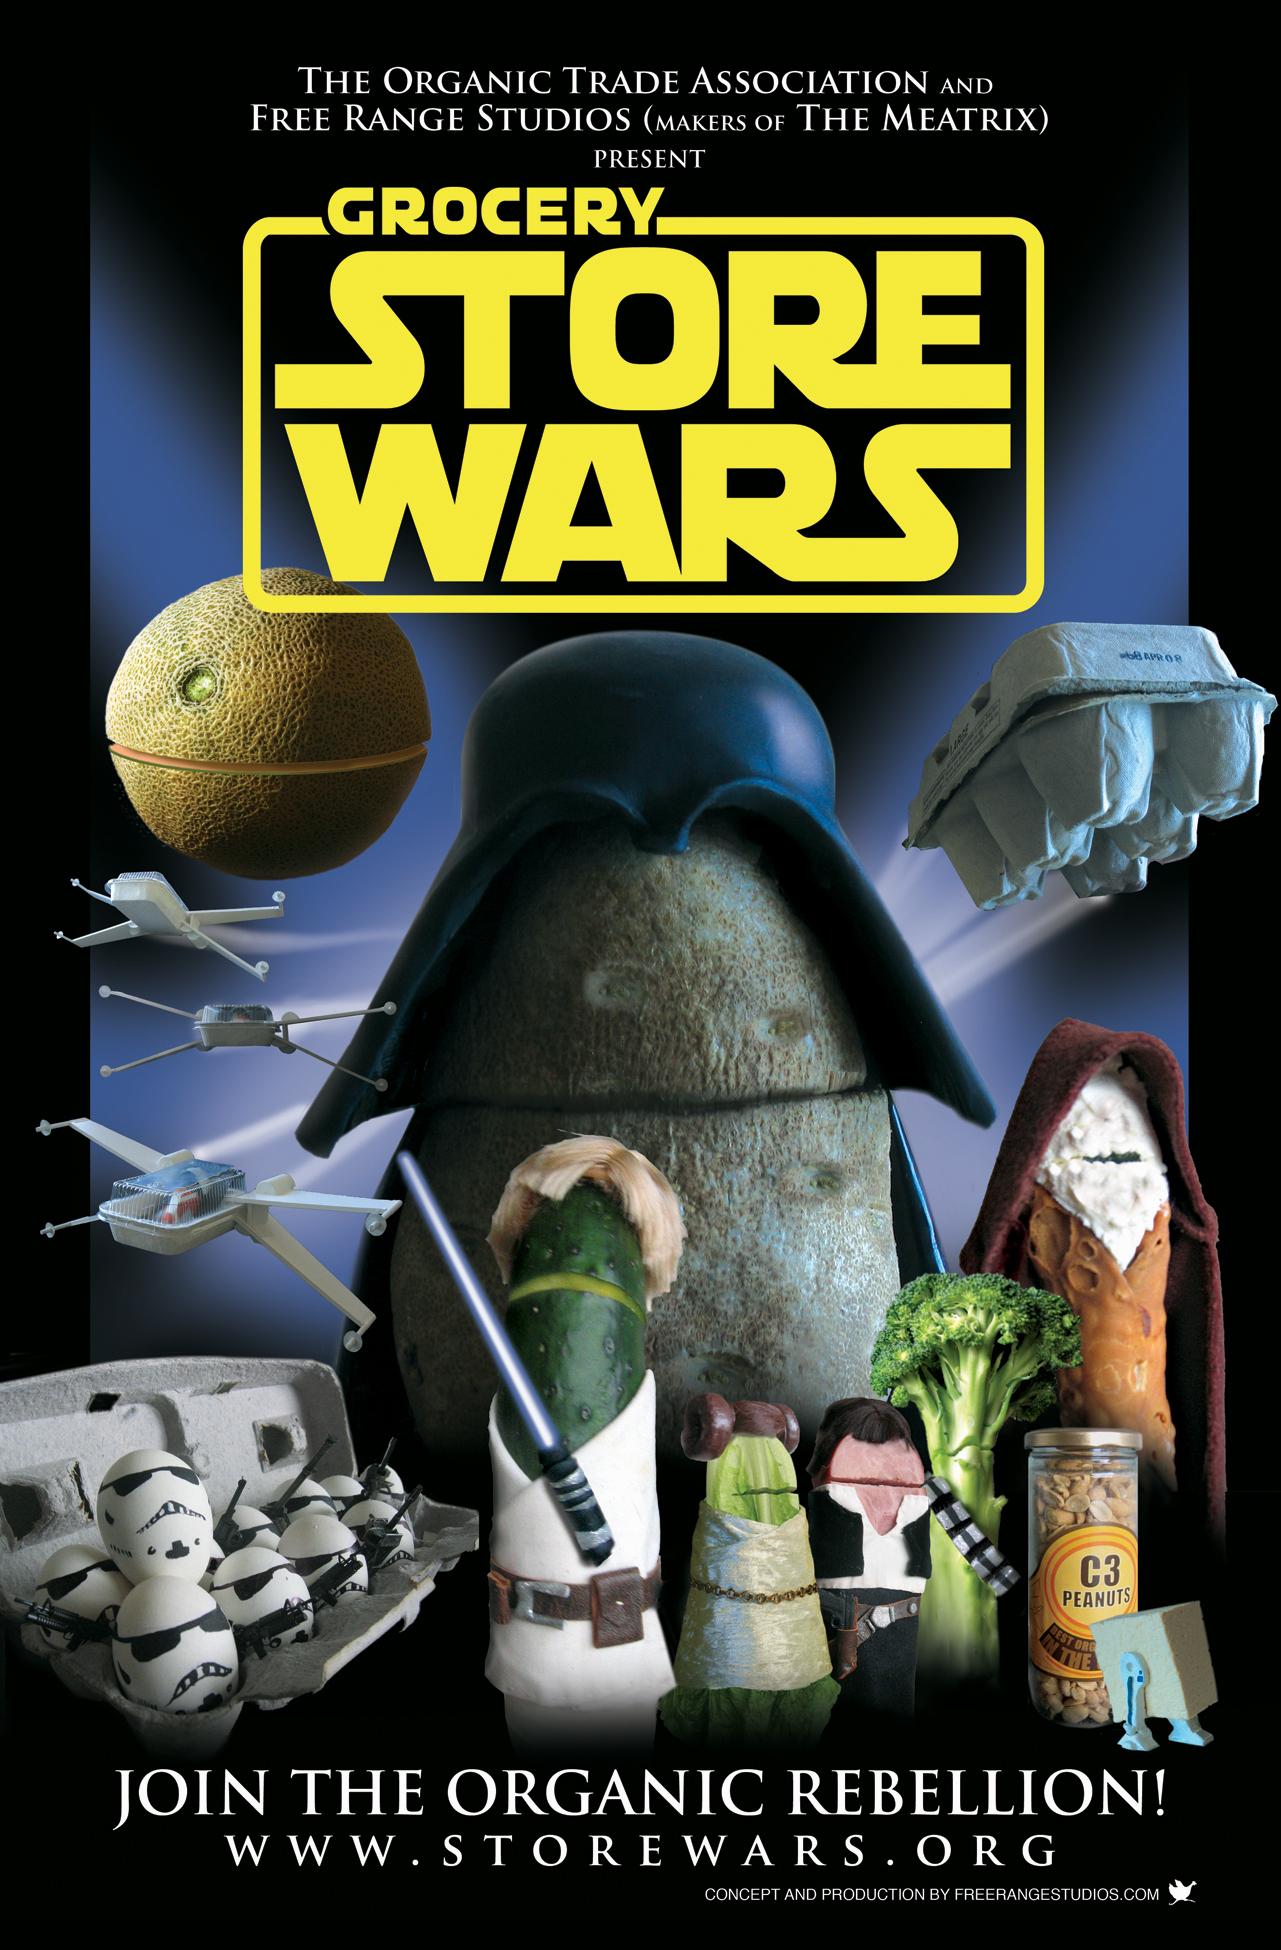 Grocery Store Wars   Star Wars Fanpedia   Fandom powered by Wikia